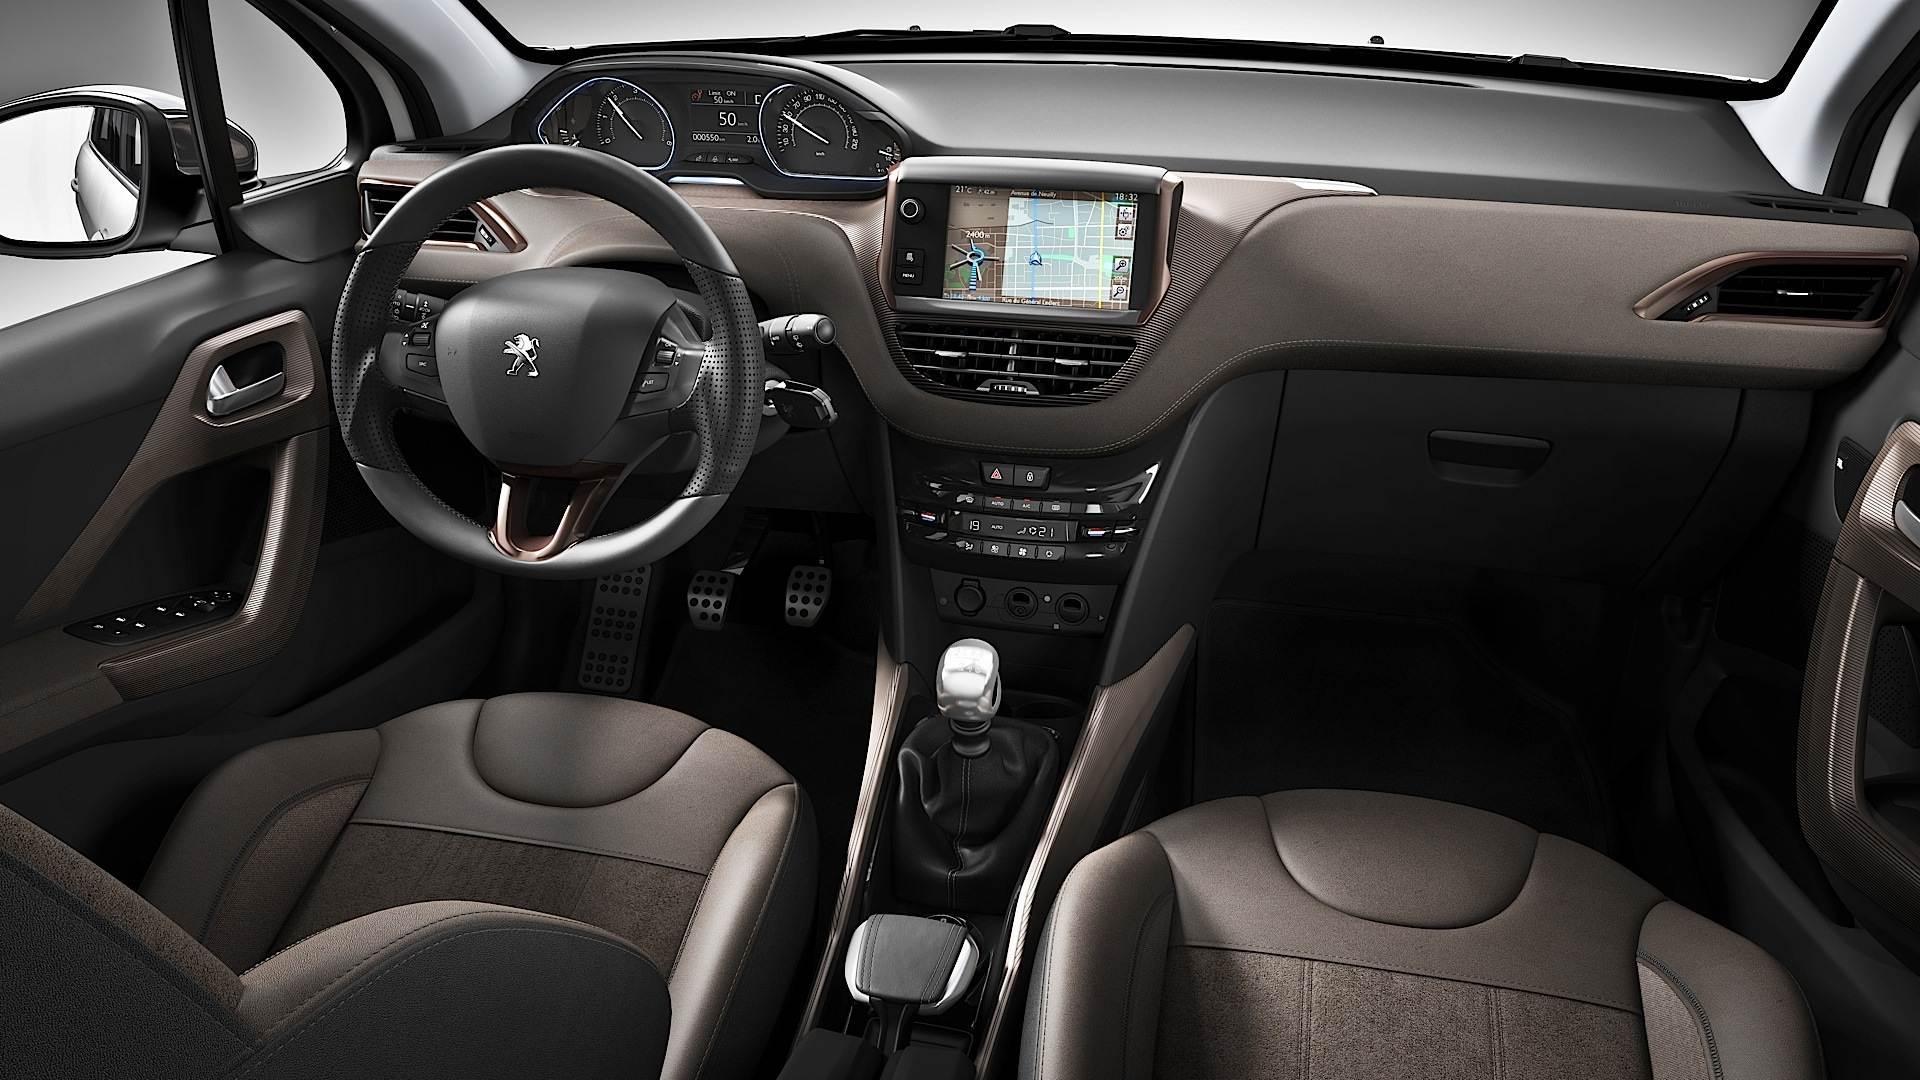 قیمت ماشین پژو 2008